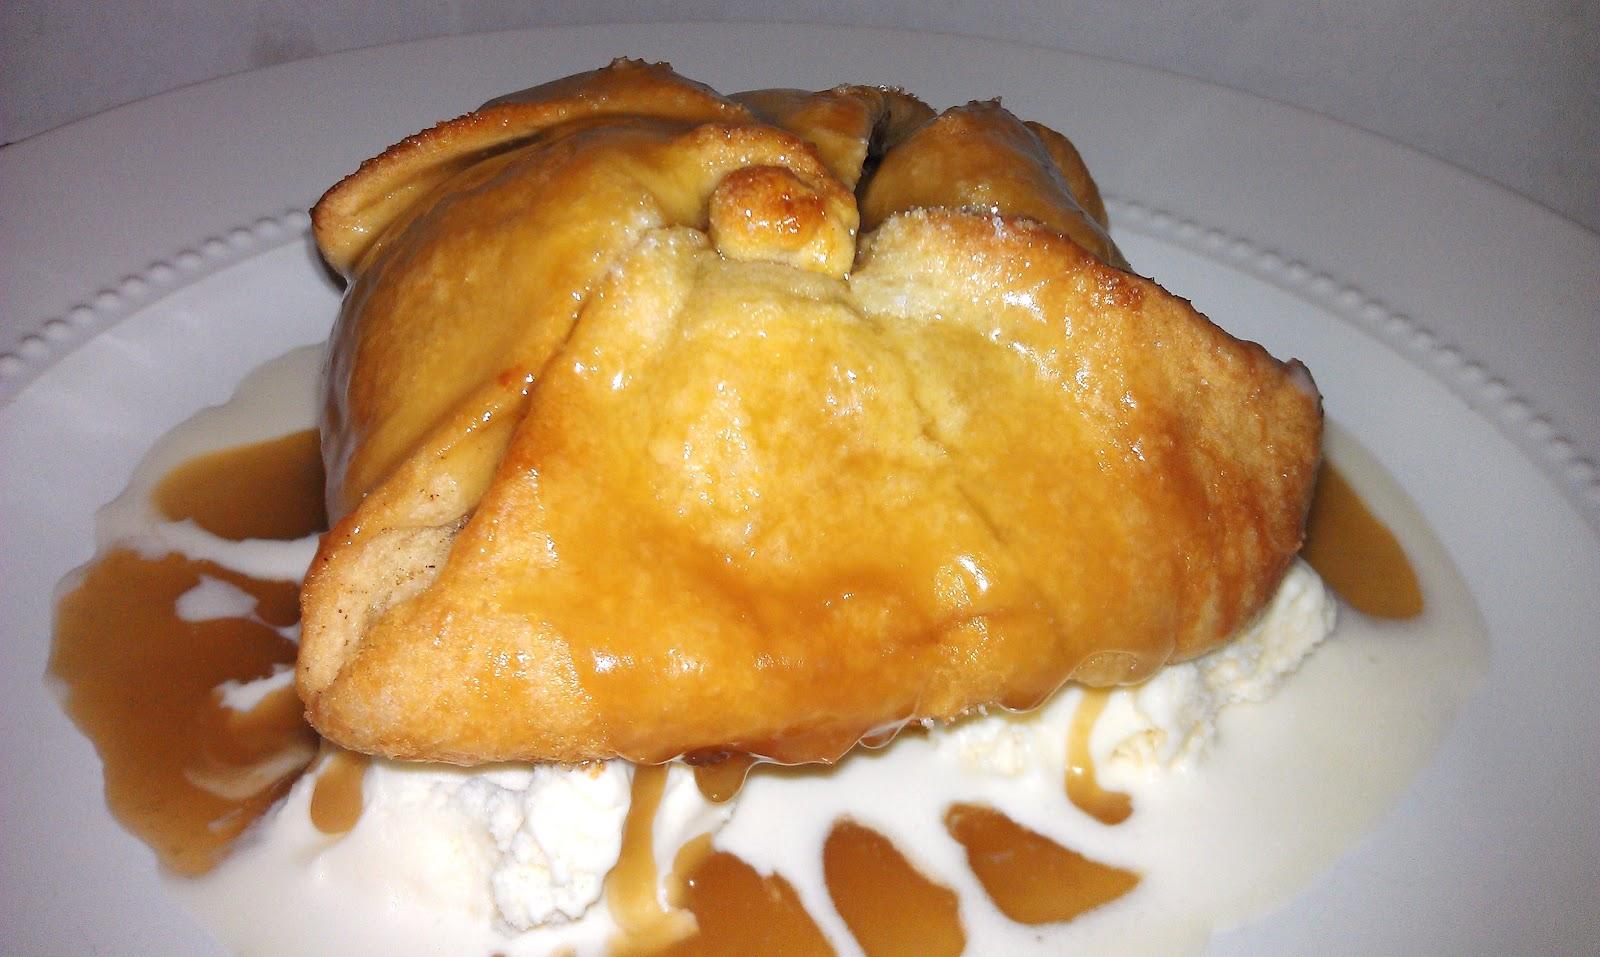 Girl + Food = Love: Bake 52: Apple Dumplings with Caramel Sauce